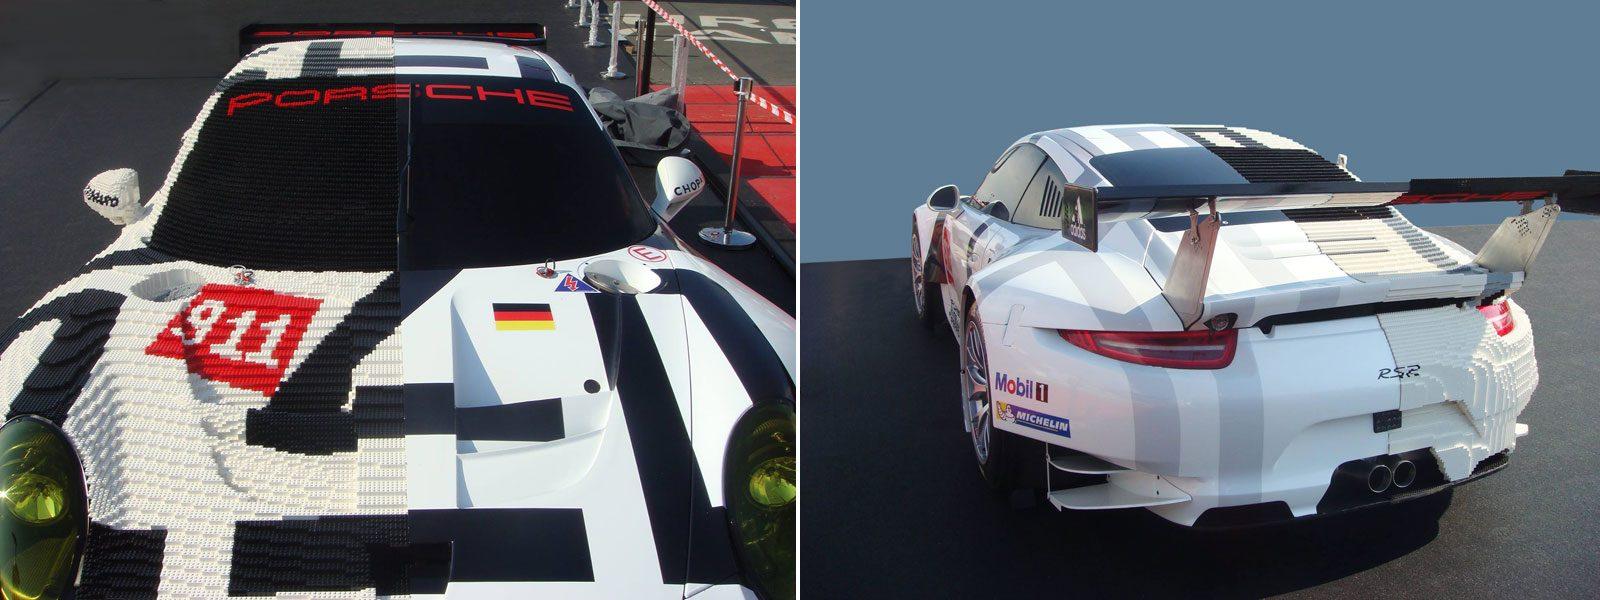 Porsche 911 RSR - half Lego bricks/half original